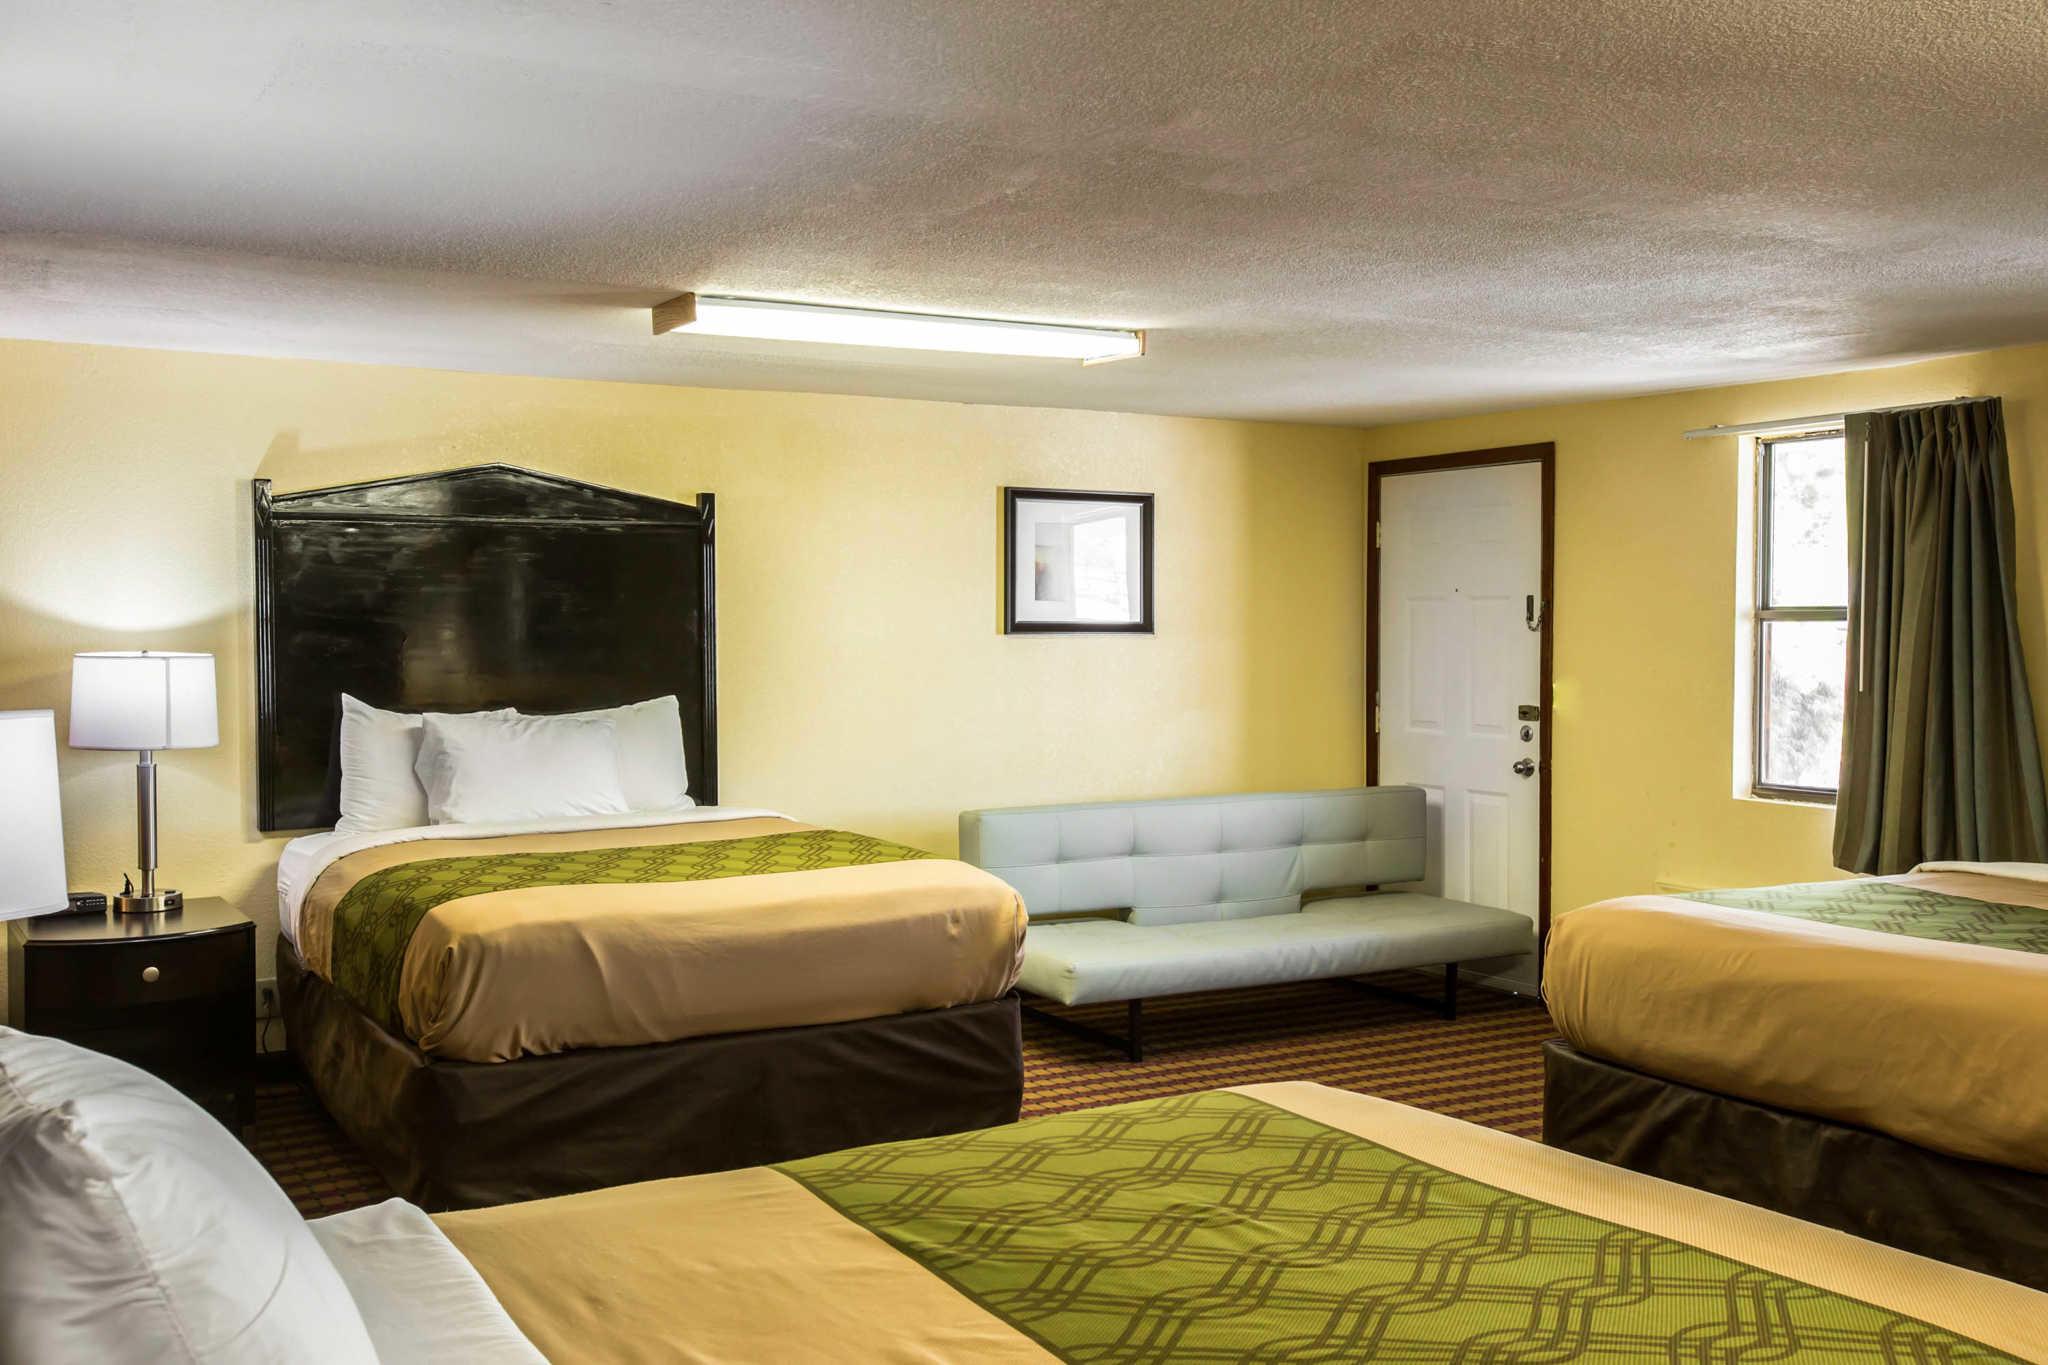 Econo Lodge image 5